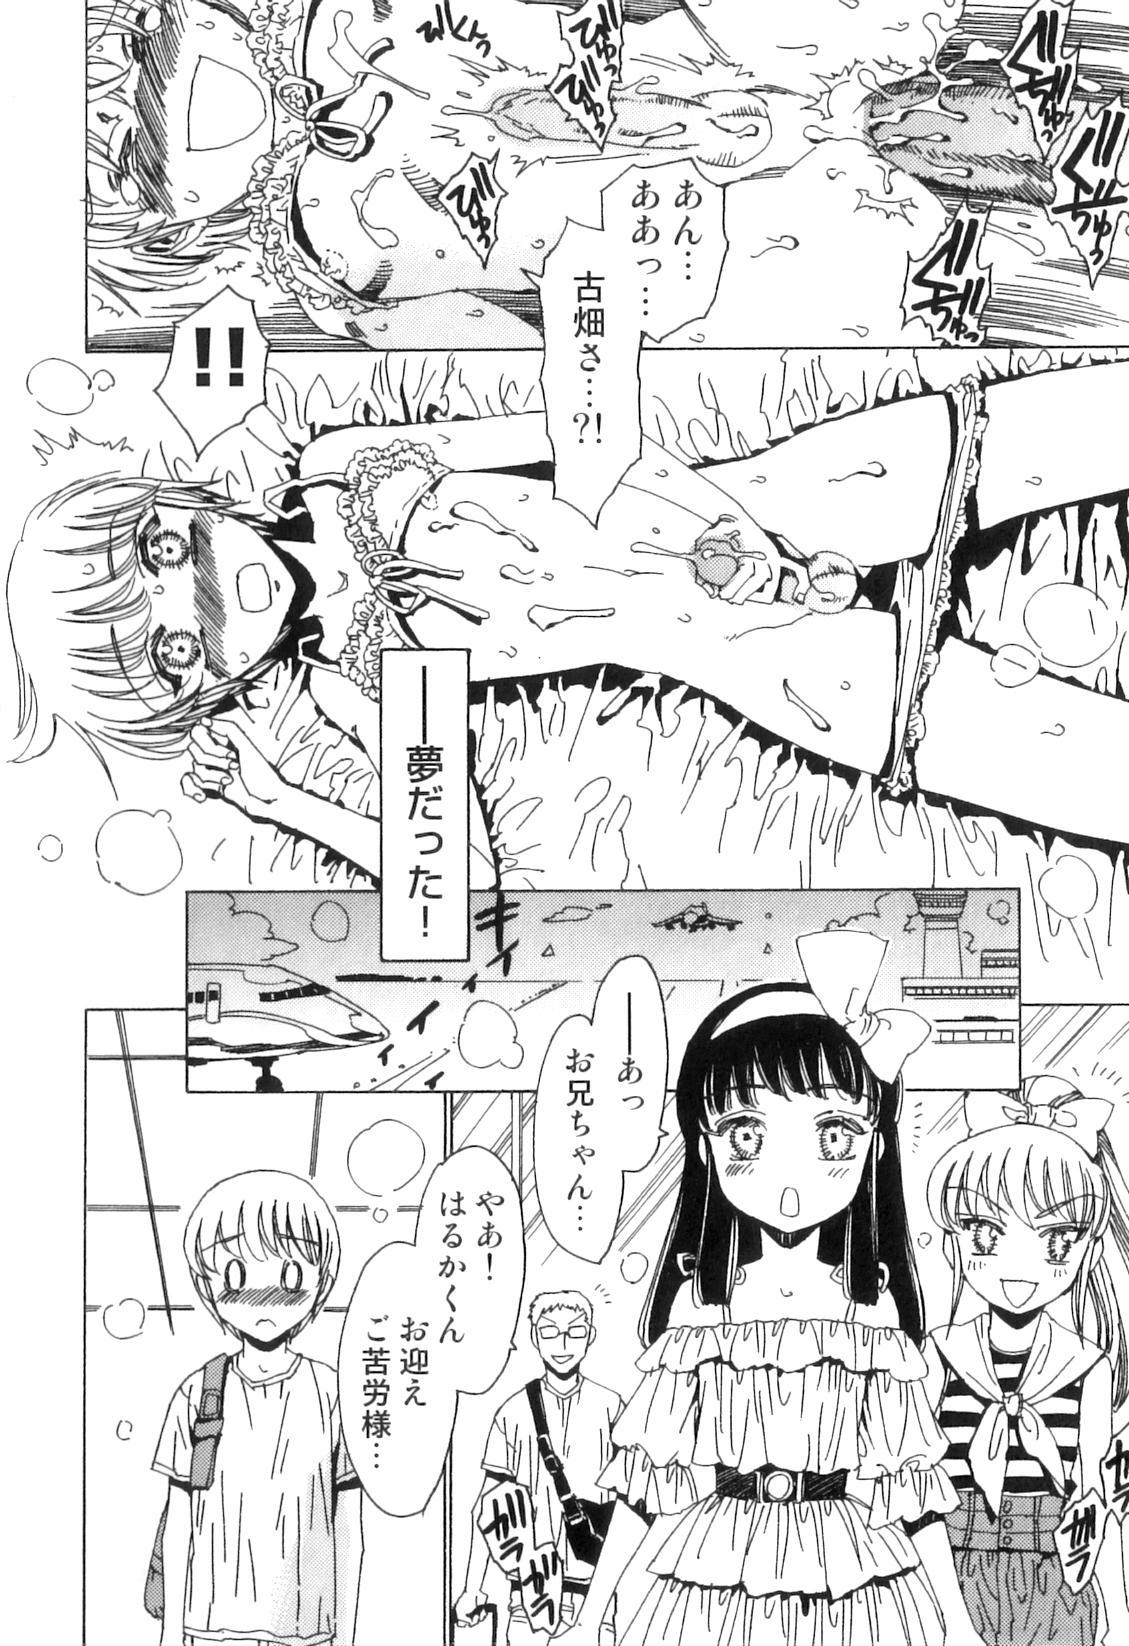 Yuni-Hapi 54